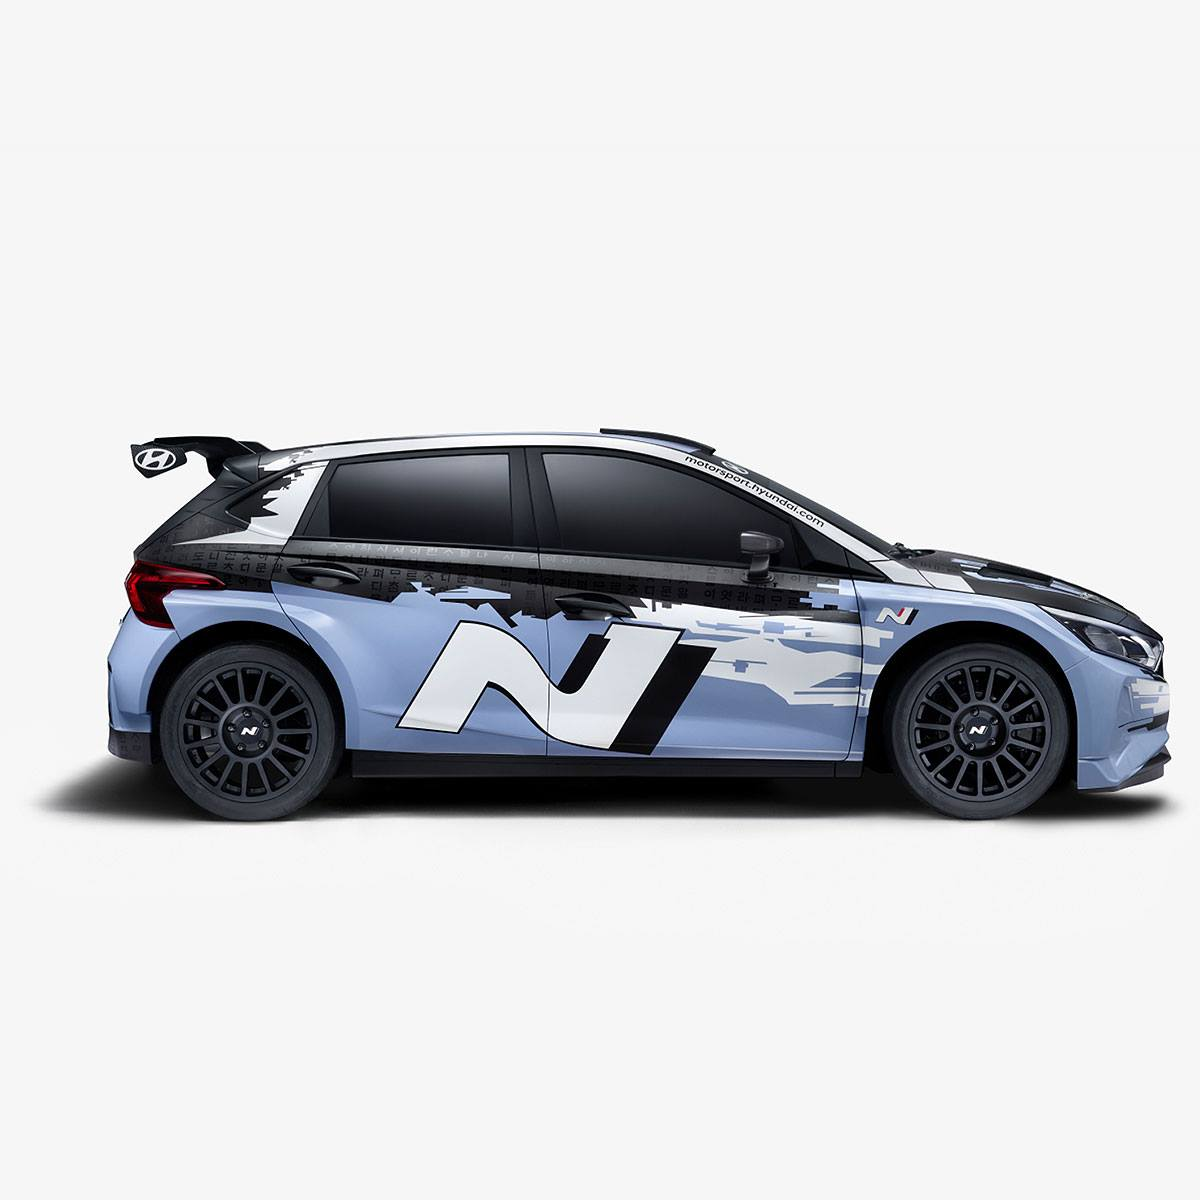 Hyundai-i20-N-rally-2